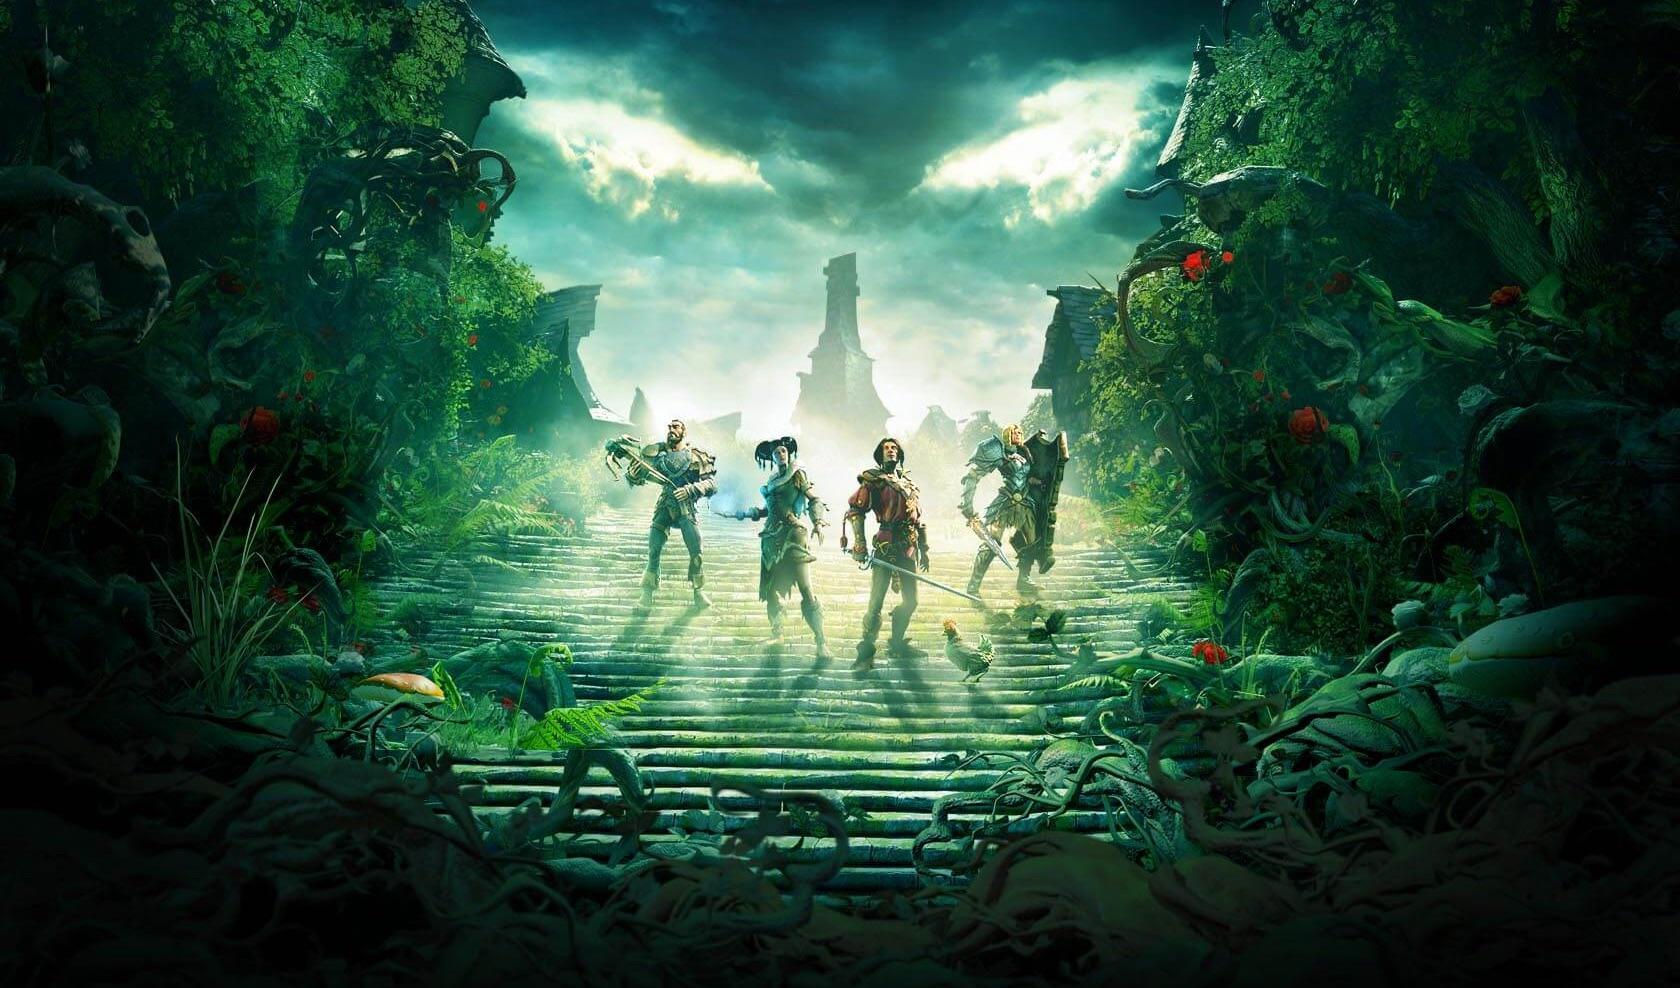 Adiós, 'Fable Legends': Microsoft cancela el juego